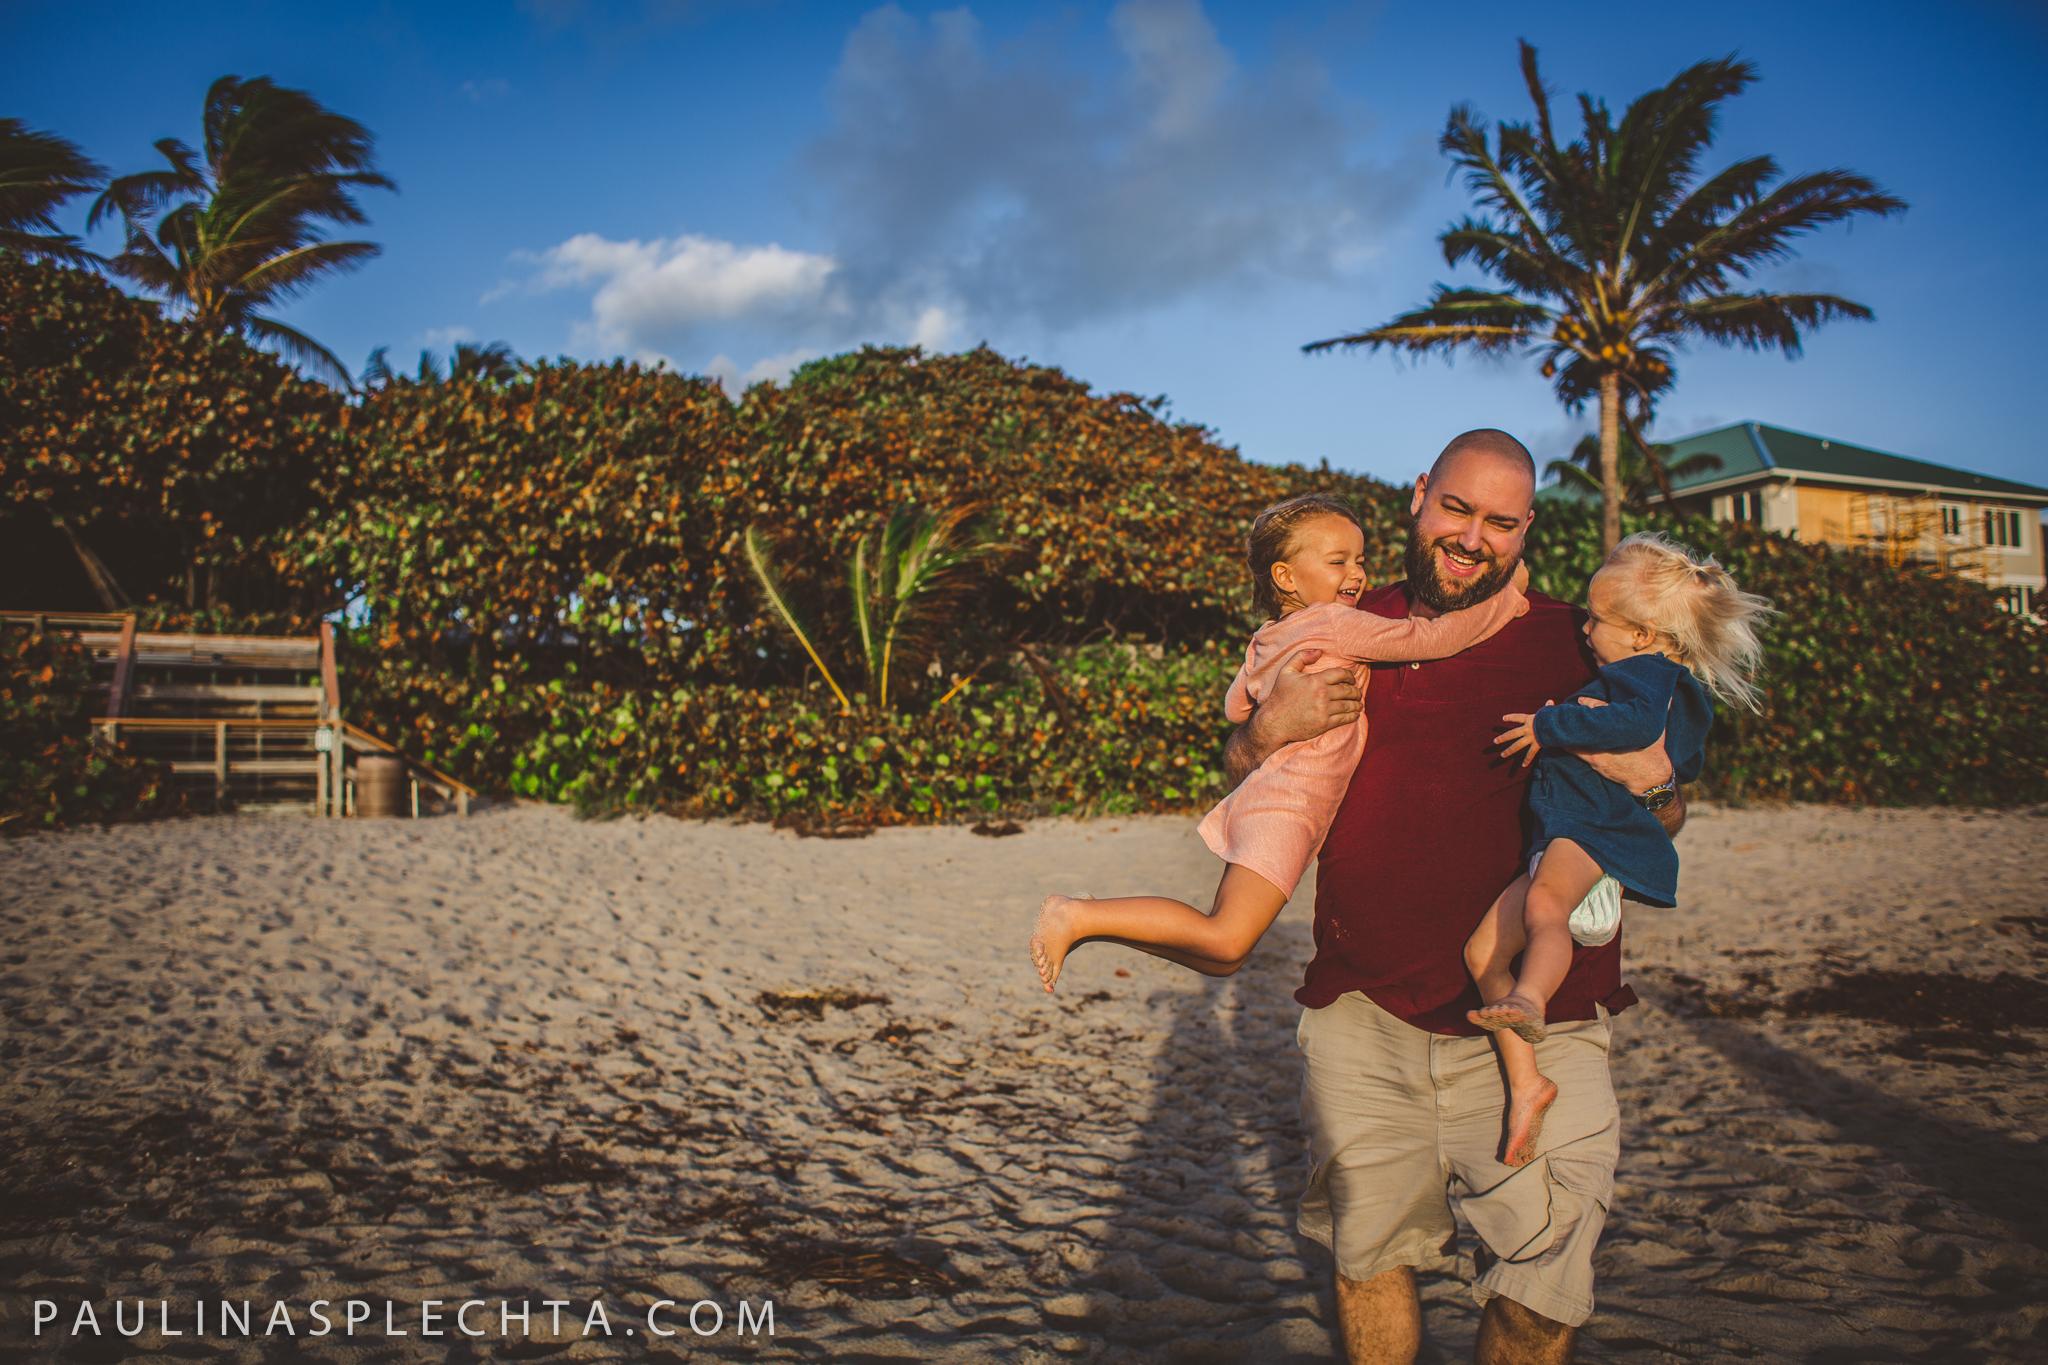 Family Photographer South Florida Pompano Broward Palm Beach Babies Baby Newborn Breastfeeding Birth Photograpy Beach Home Documentary Session-103.jpg